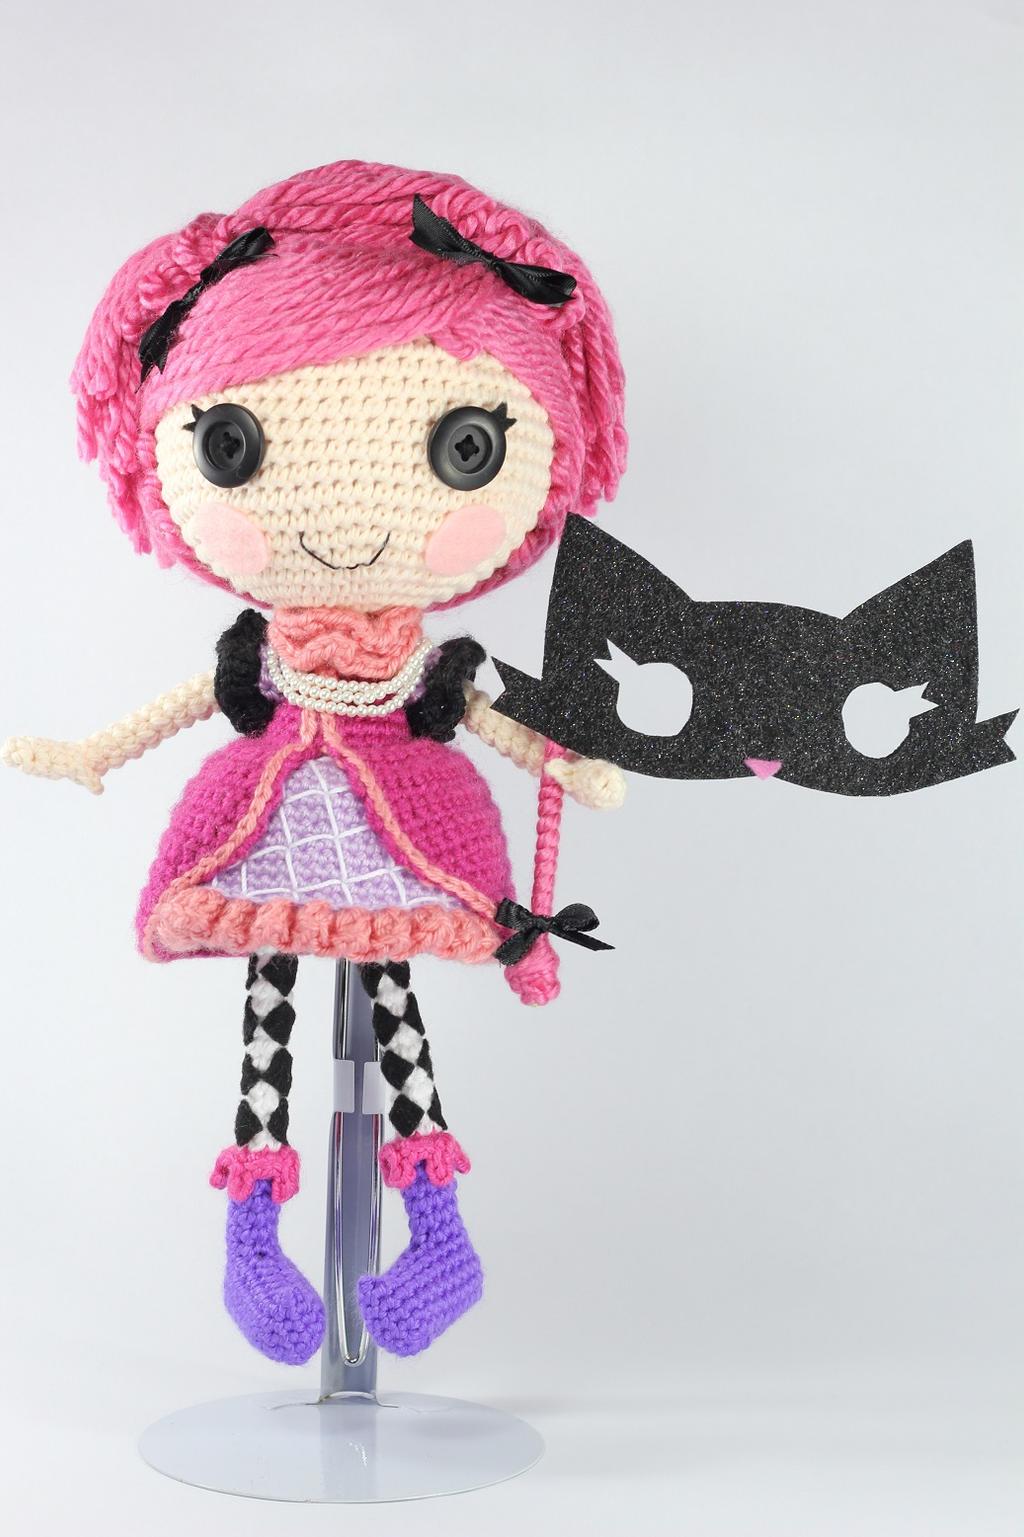 Amigurumi Doll Lalaloopsy : LALALOOPSY Confetti Carnivale Amigurumi Doll by Npantz22 ...